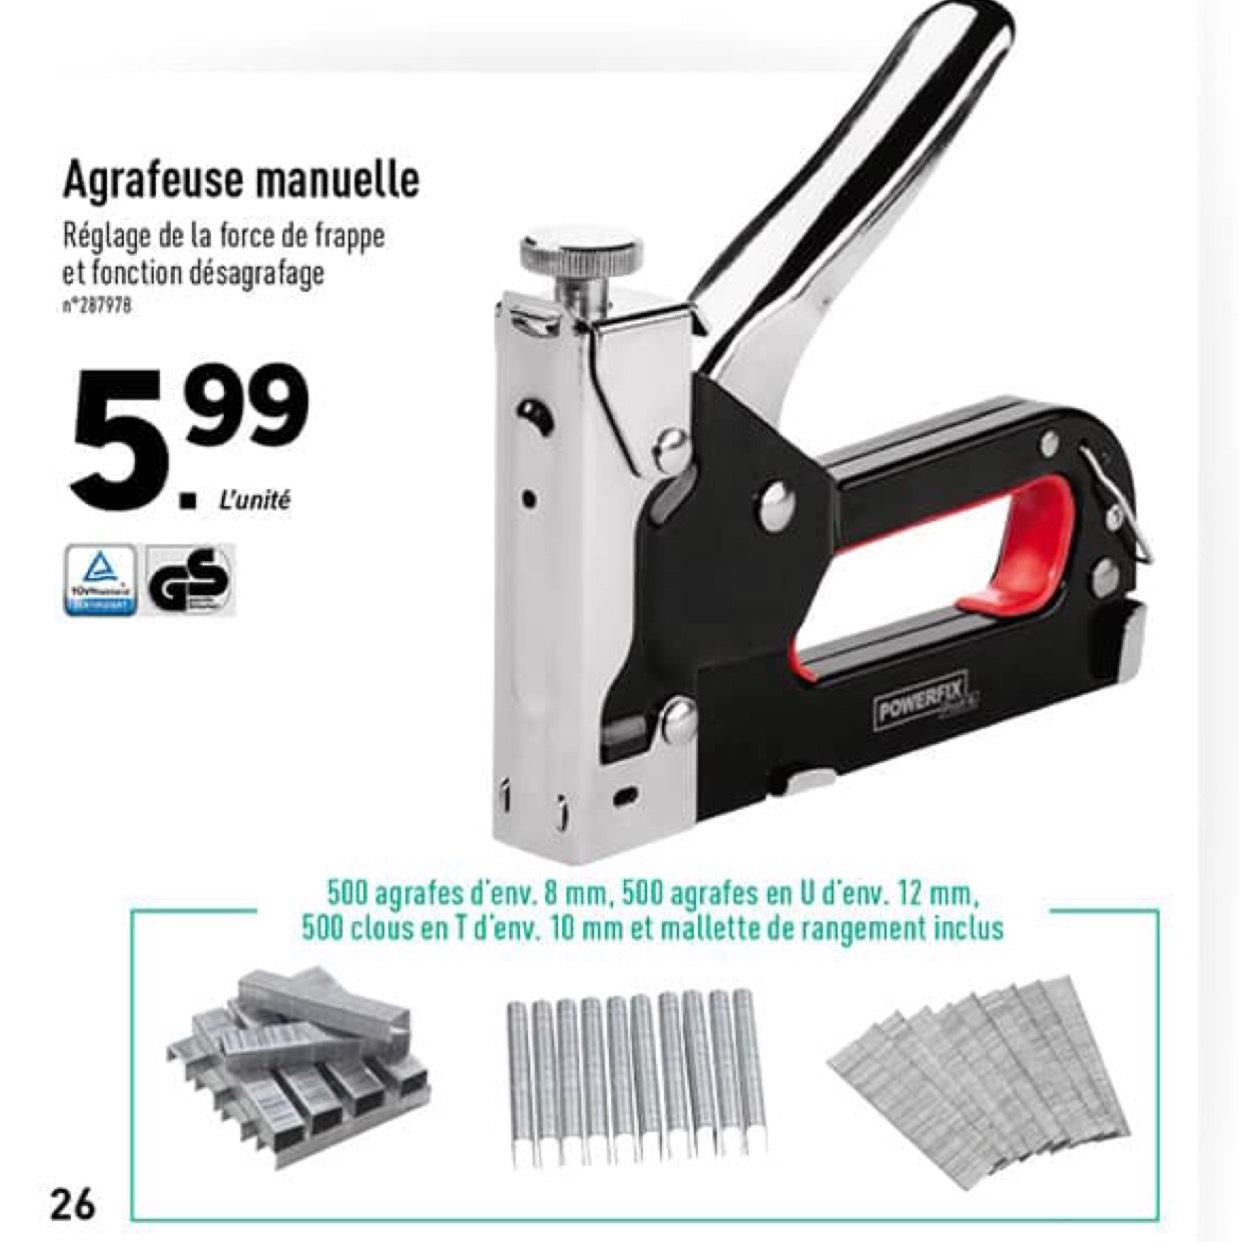 agrafeuse manuelle powerfix 500 agrafes 8mm 500. Black Bedroom Furniture Sets. Home Design Ideas